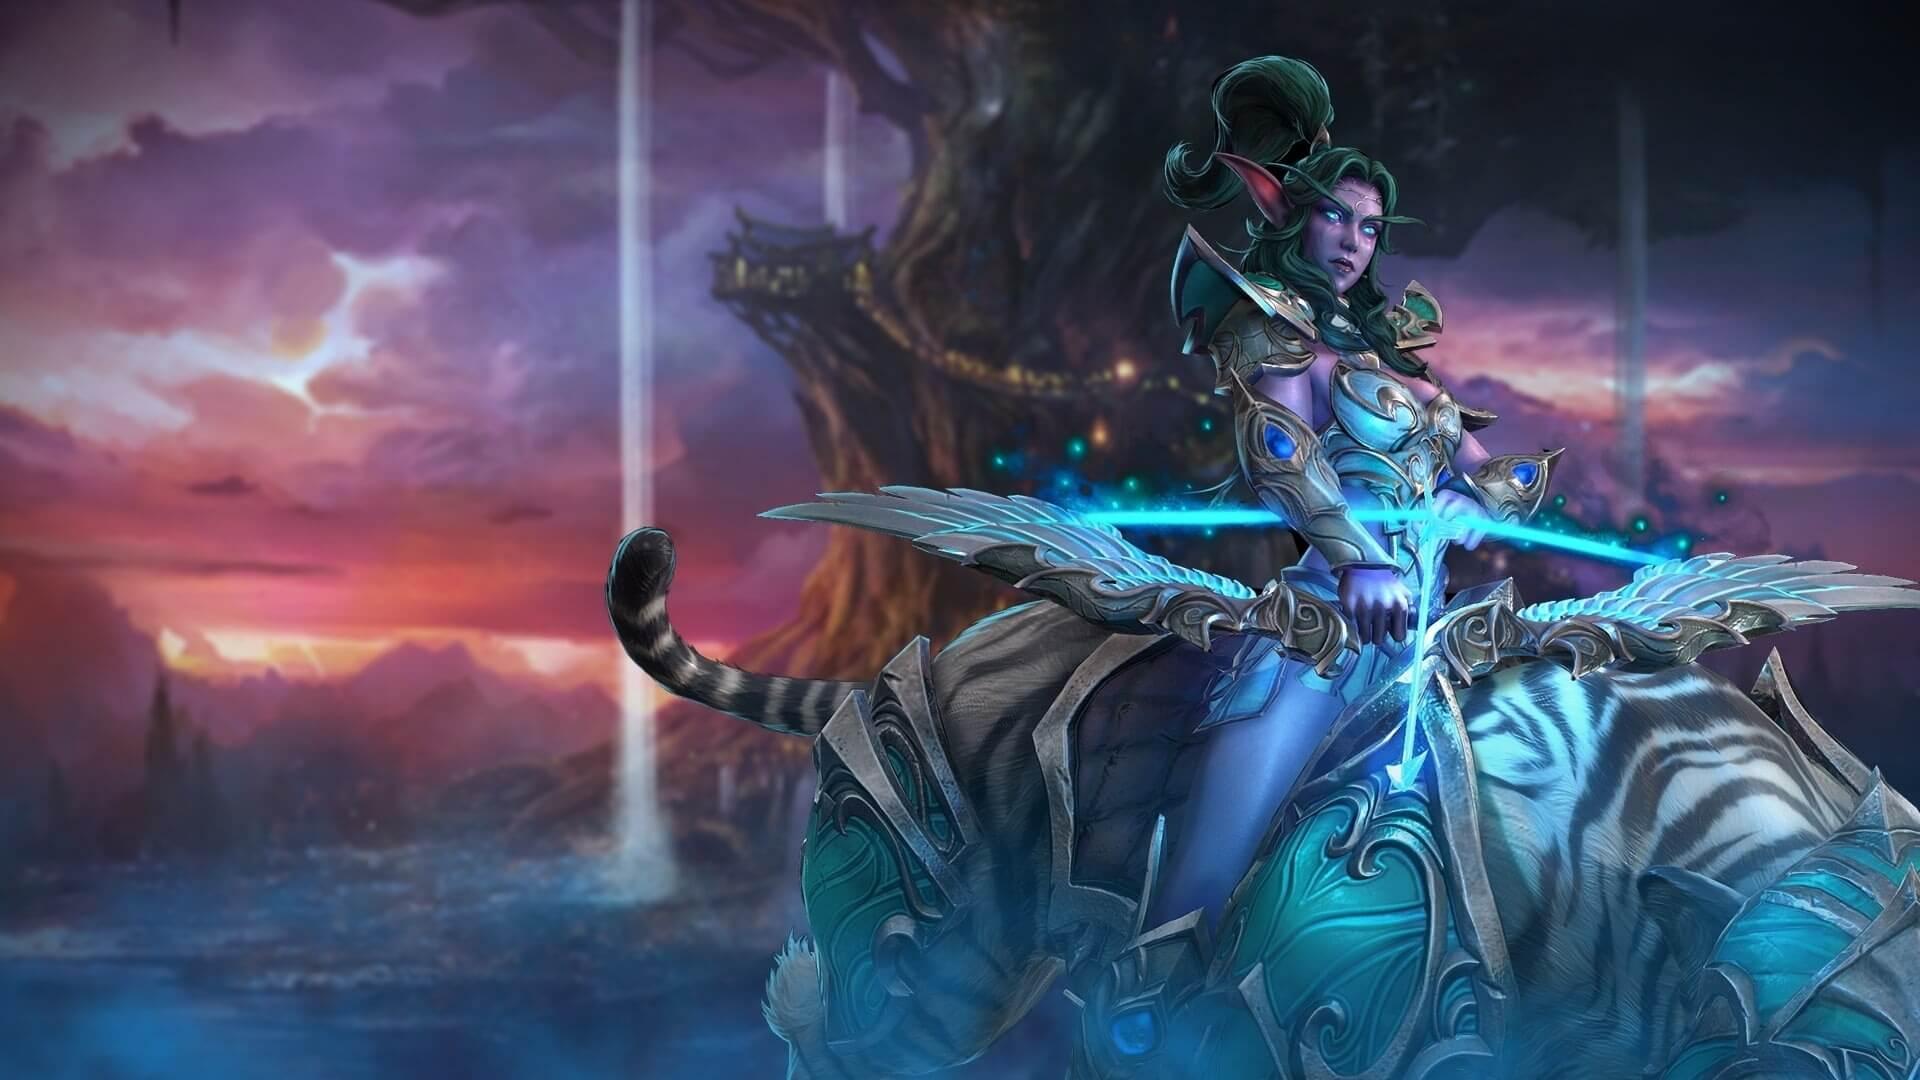 Warcraft 3 Reforged: планы Blizzard по решению проблем